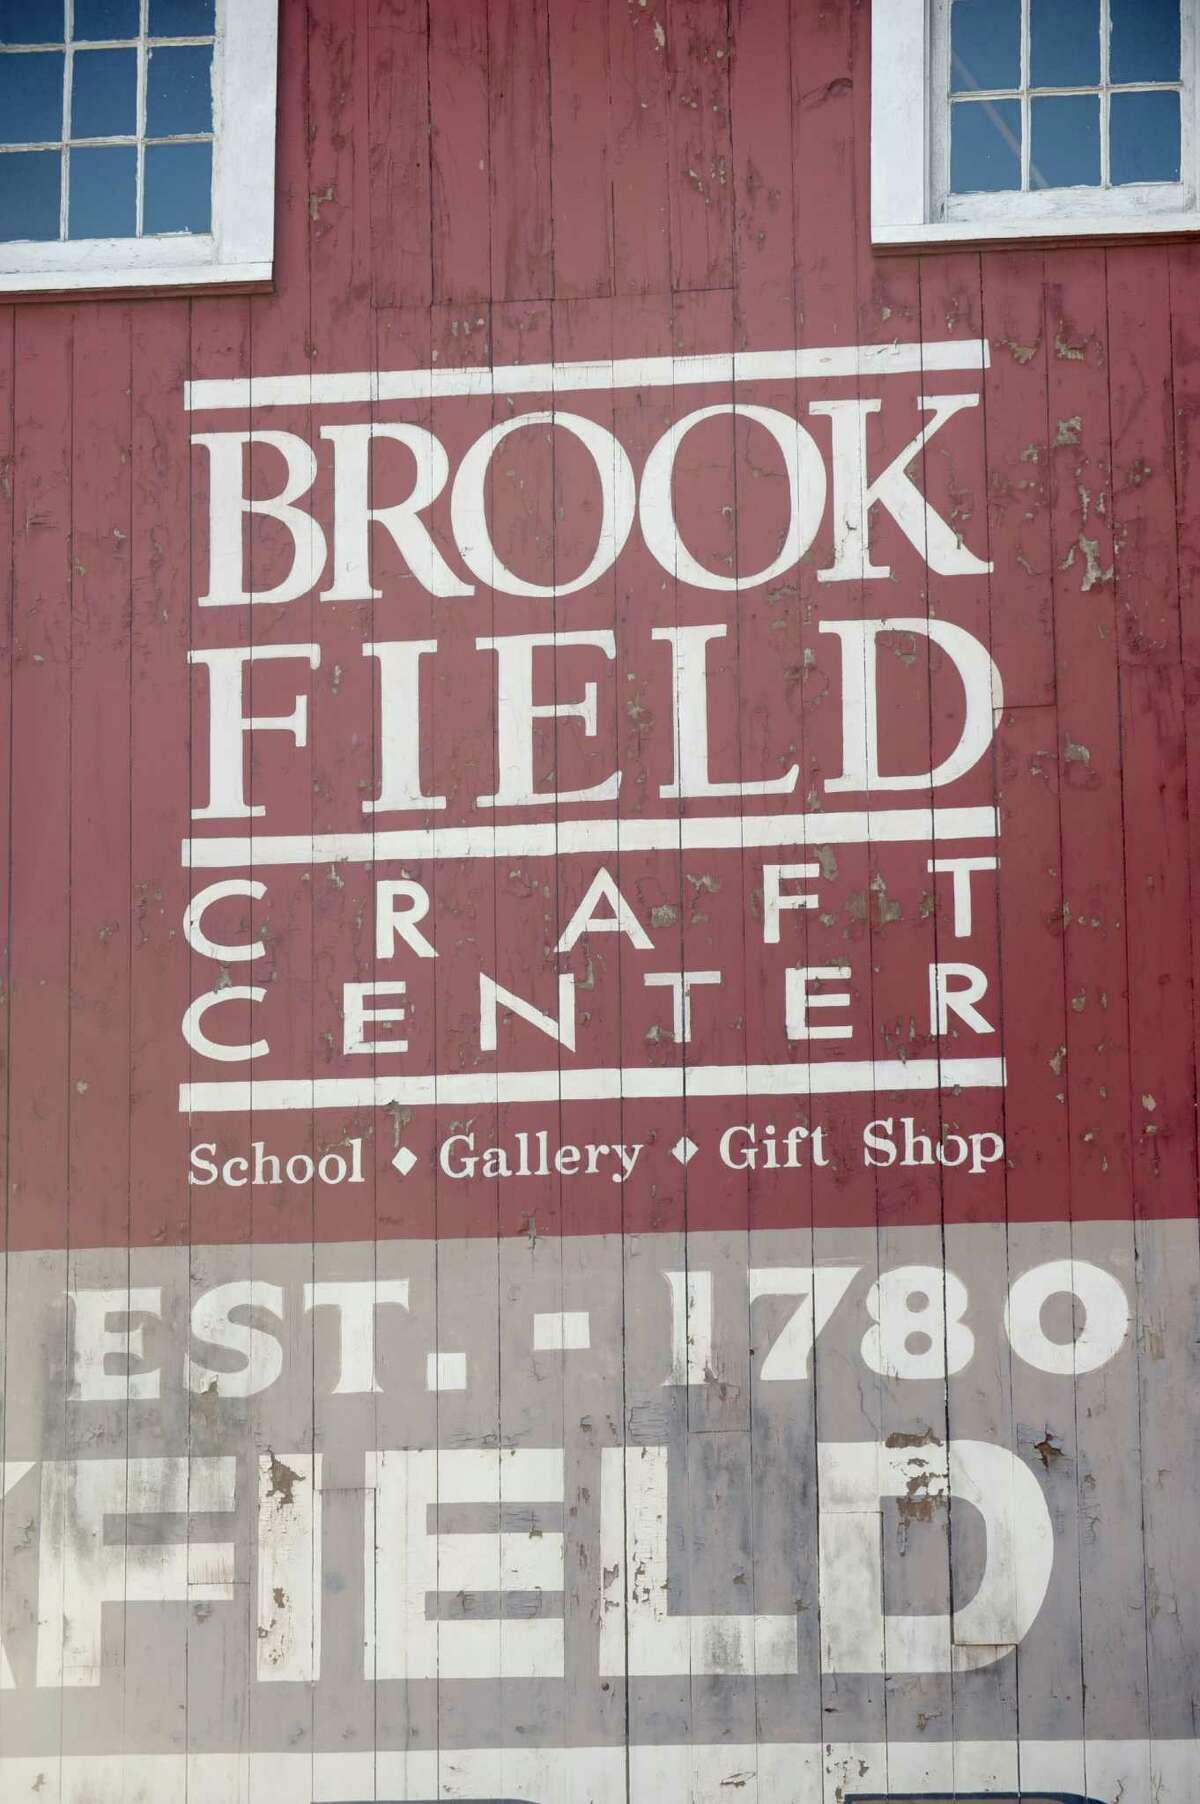 The Brookfield Craft Center.